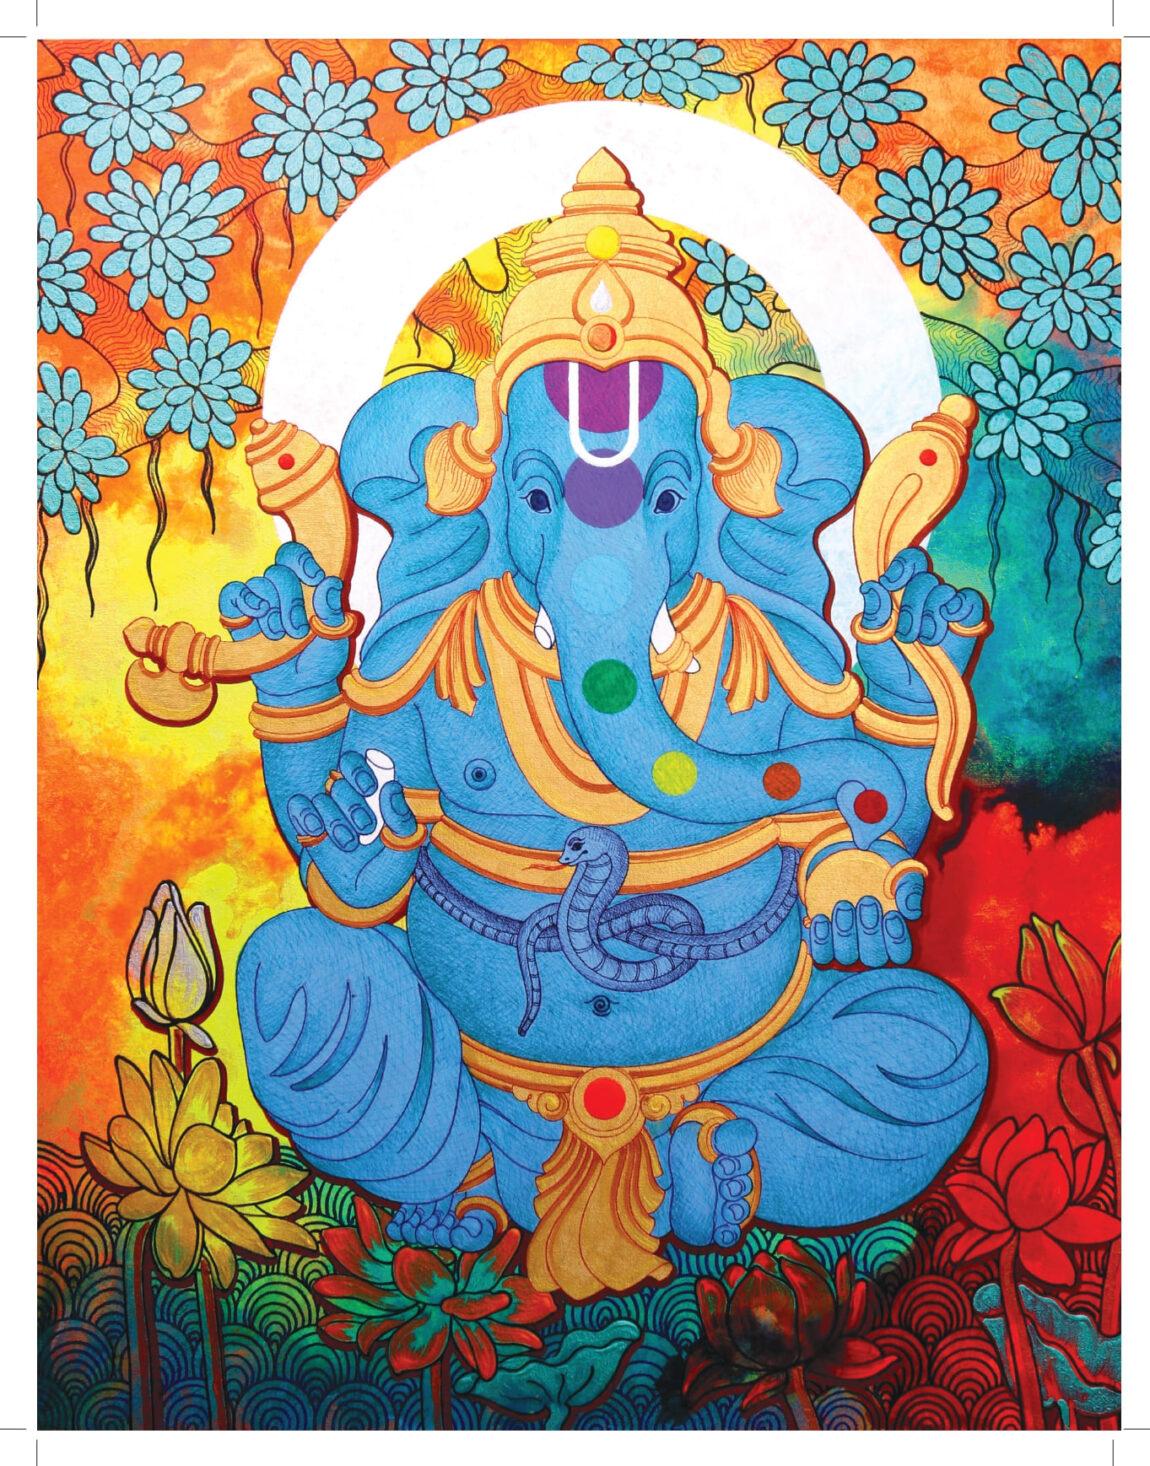 Ganesh-print_pages-to-jpg-0383.jpg